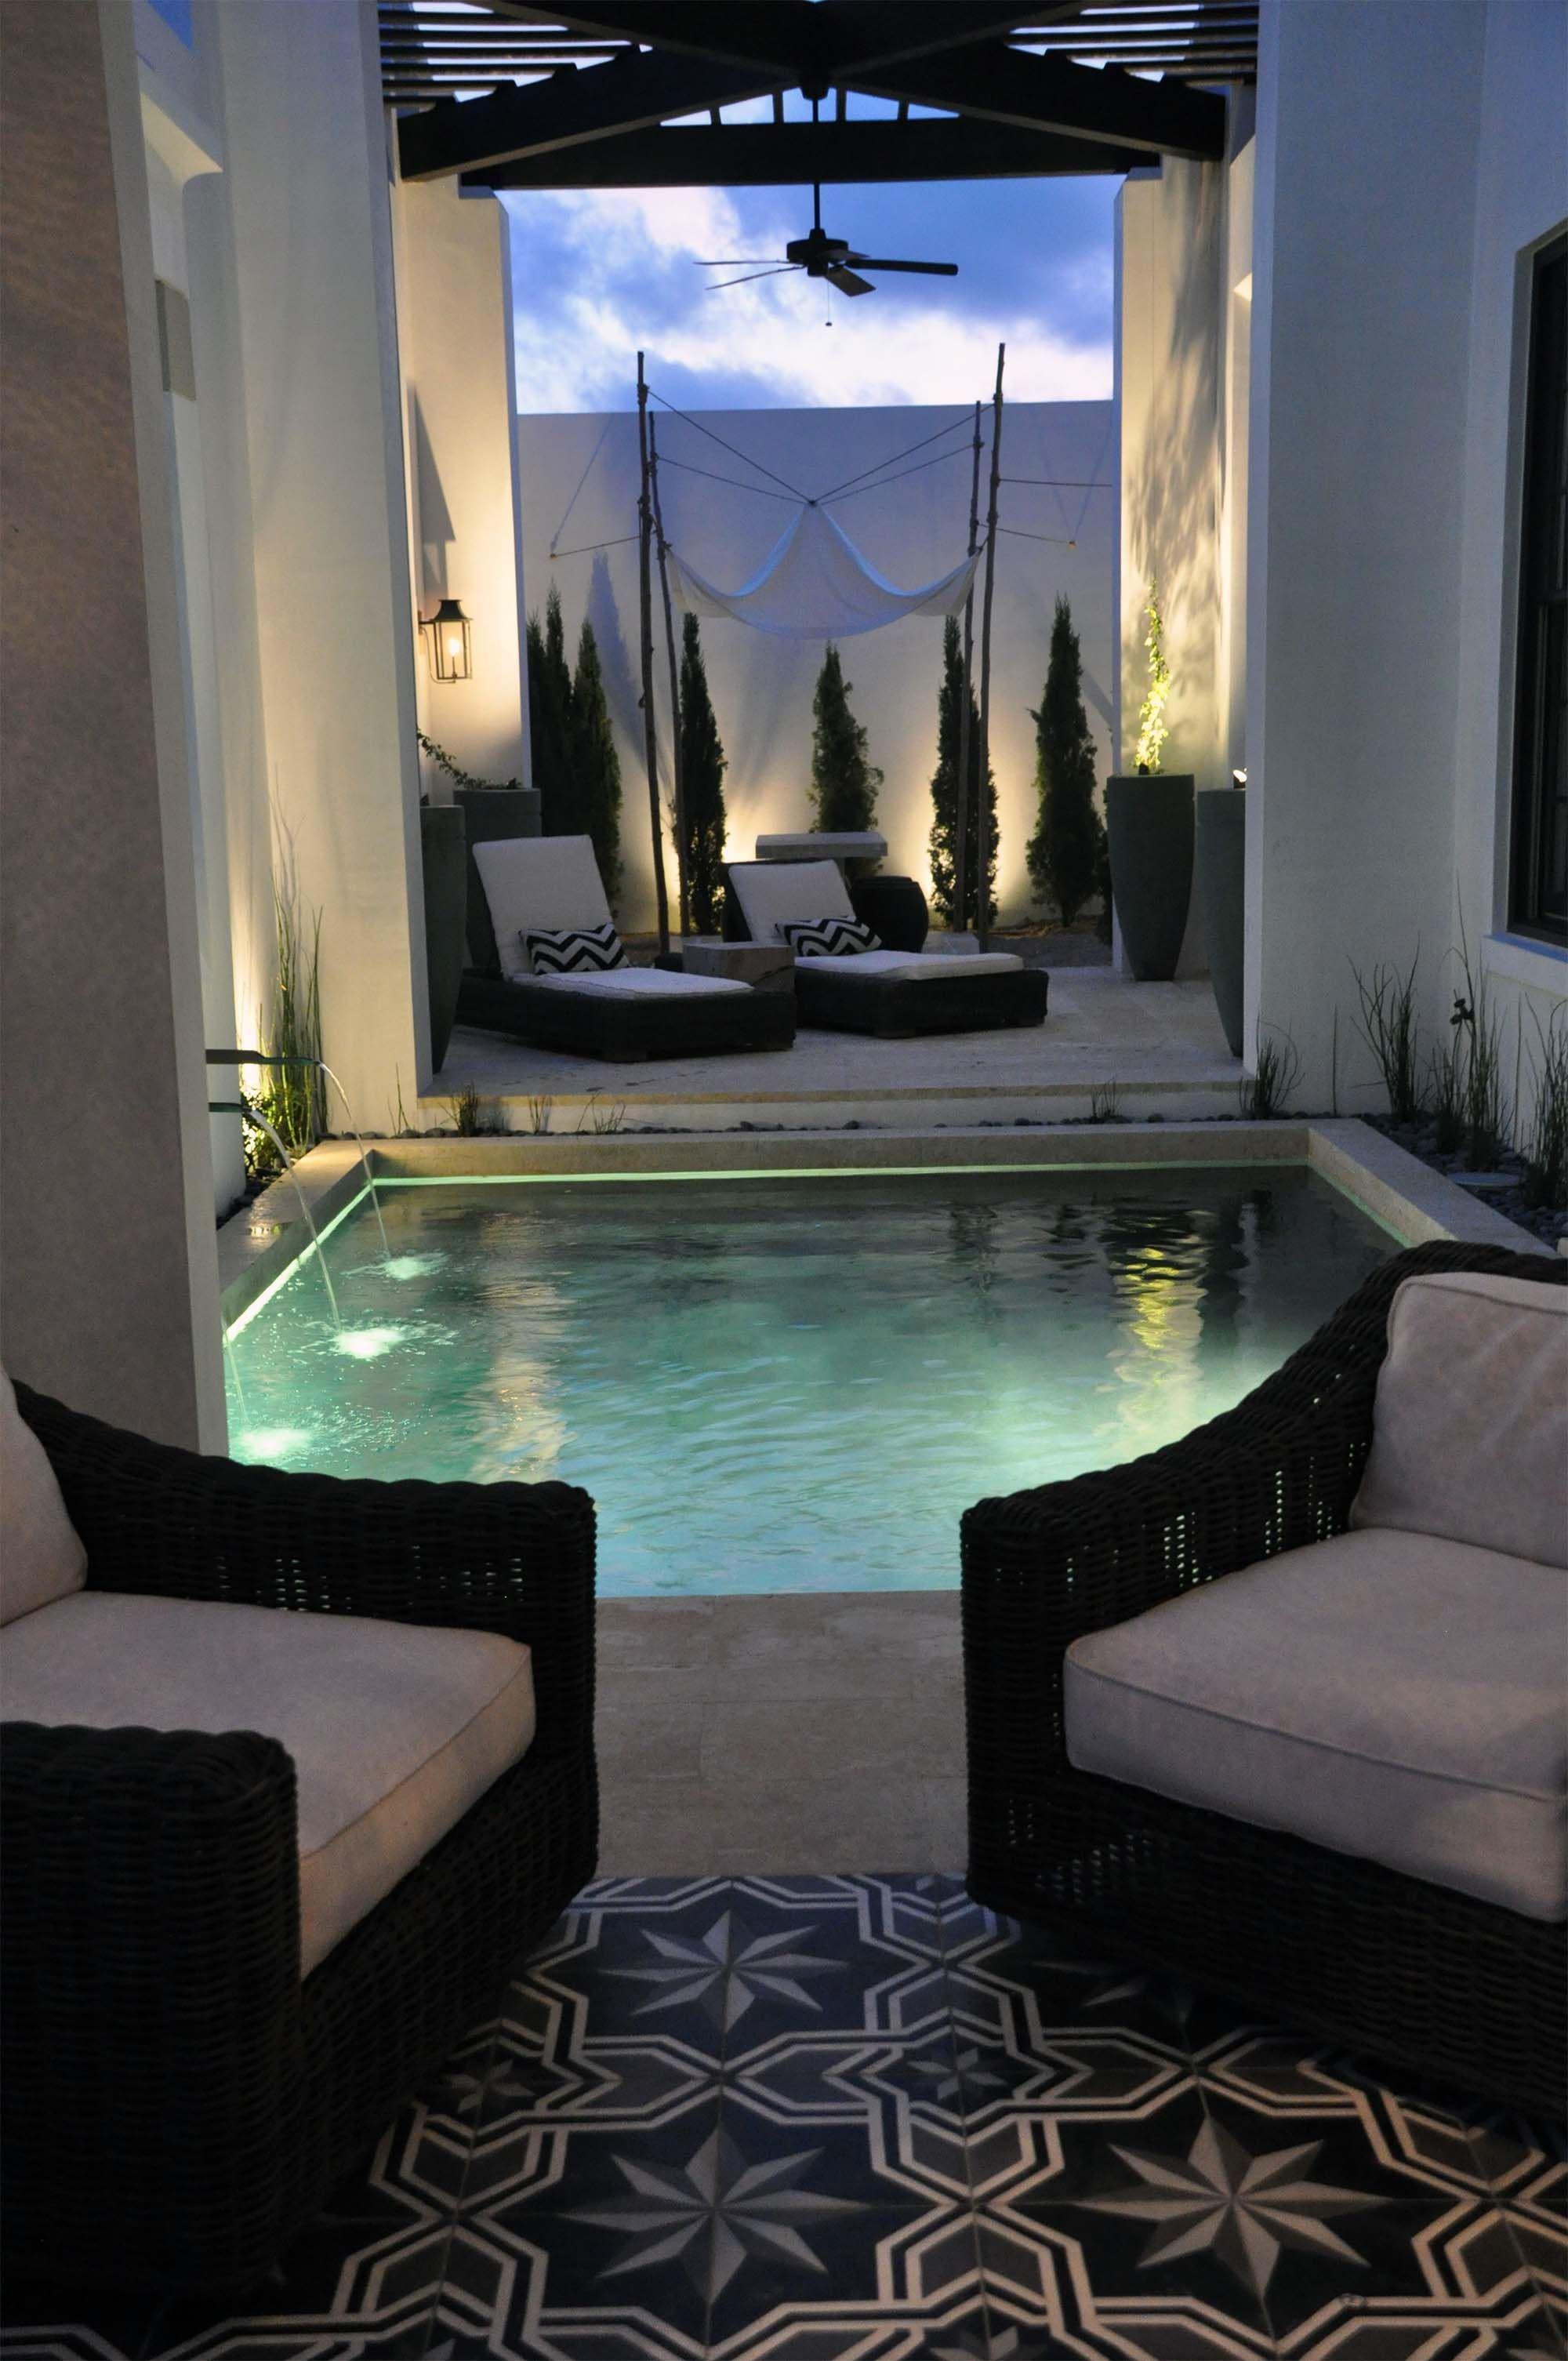 Beautiful Pool House View In Ground Pool Black Wicker Furniture With Tan Cushions Lounge Cha Indoor Swimming Pool Design Diy Swimming Pool Small Pool Design